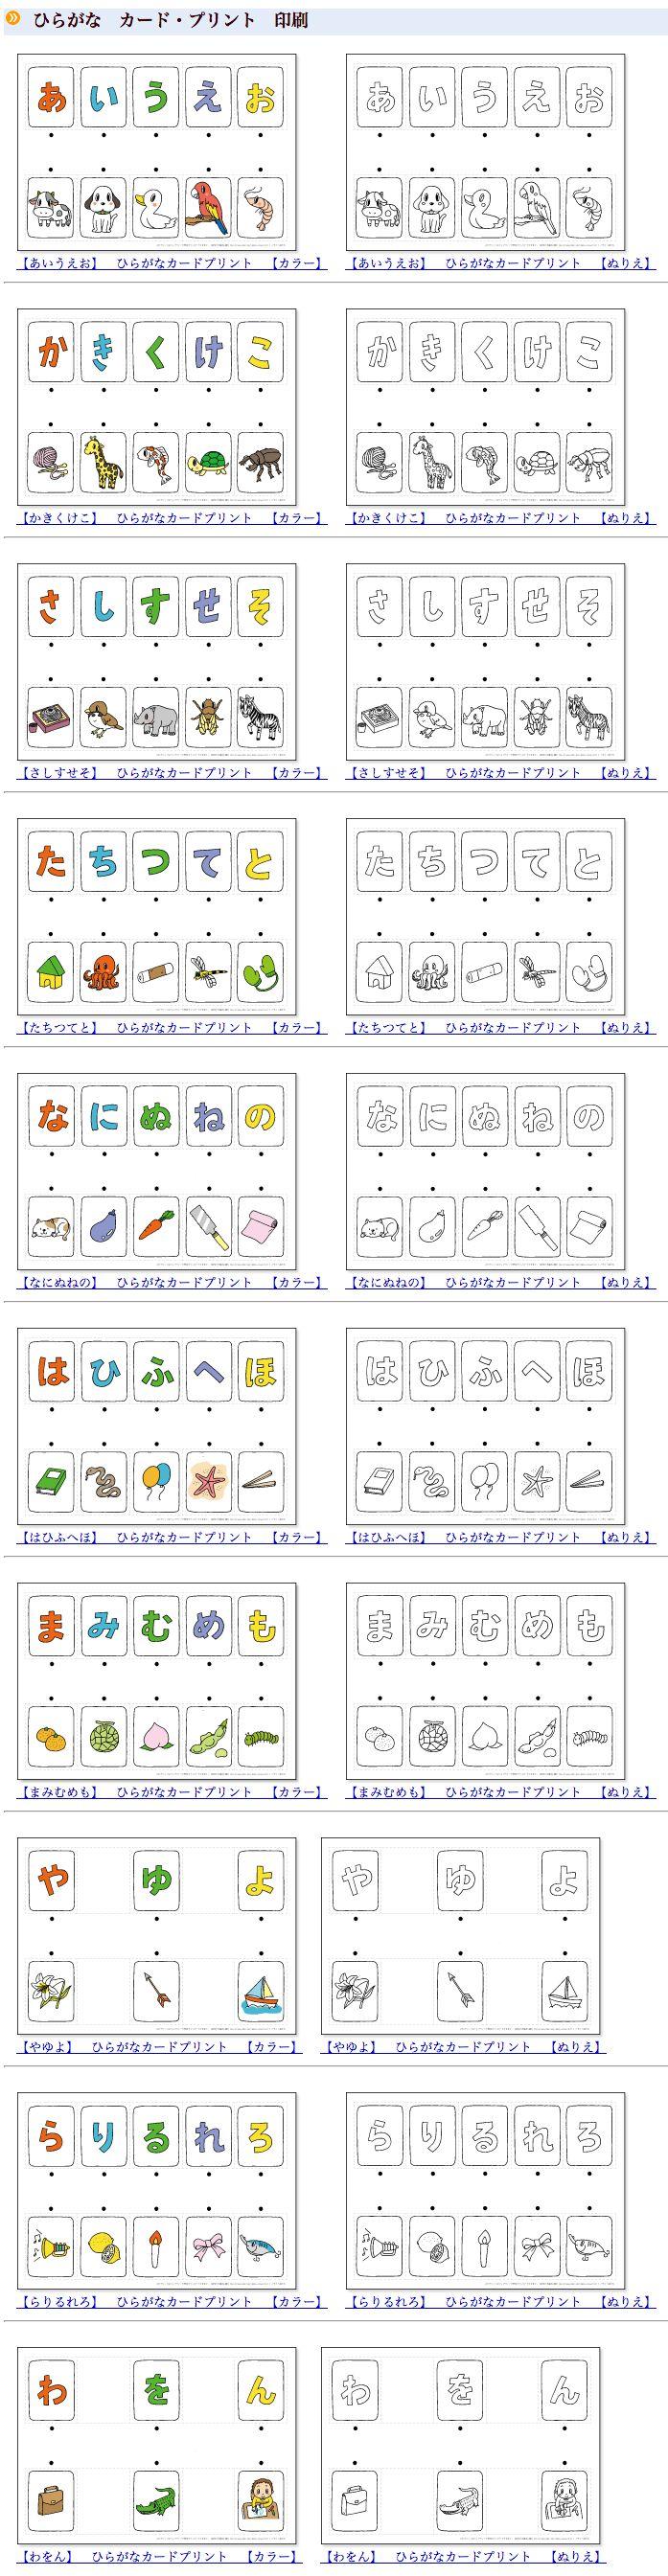 Homeschool Japan alphabet